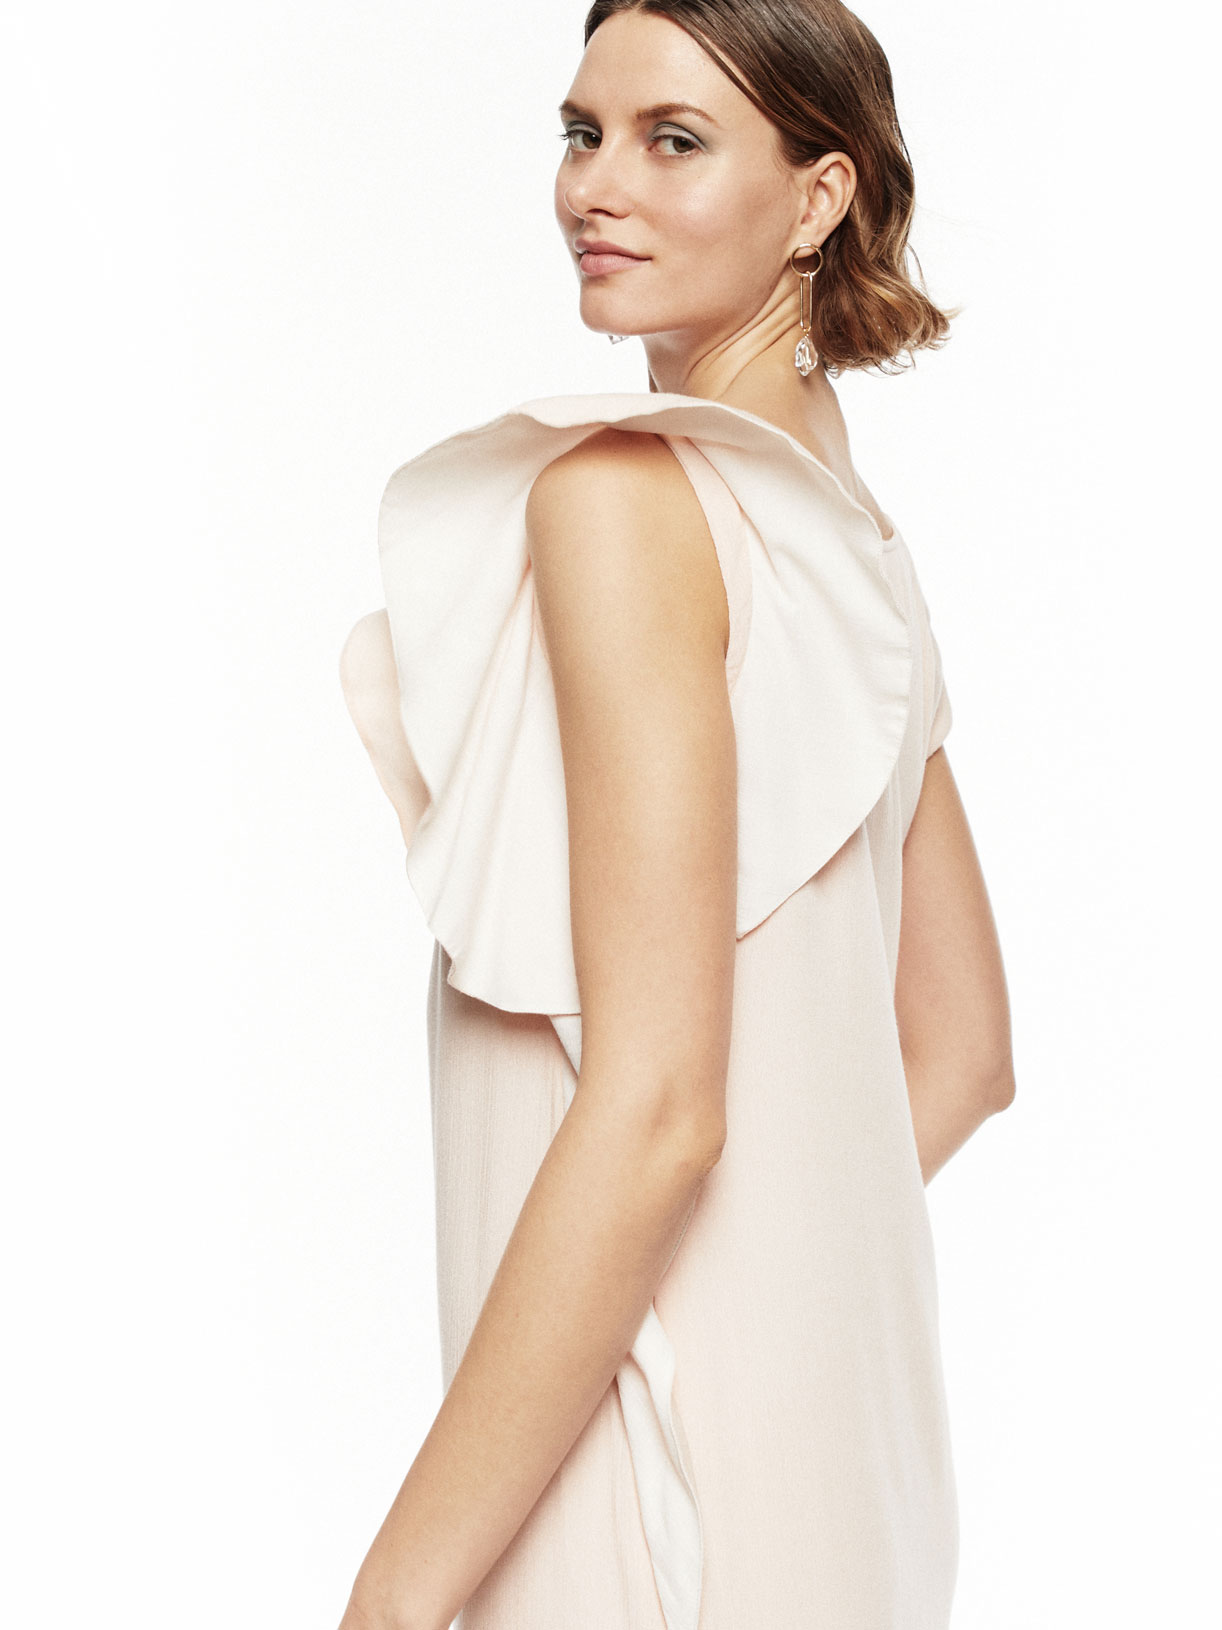 Meurice - Robe courte